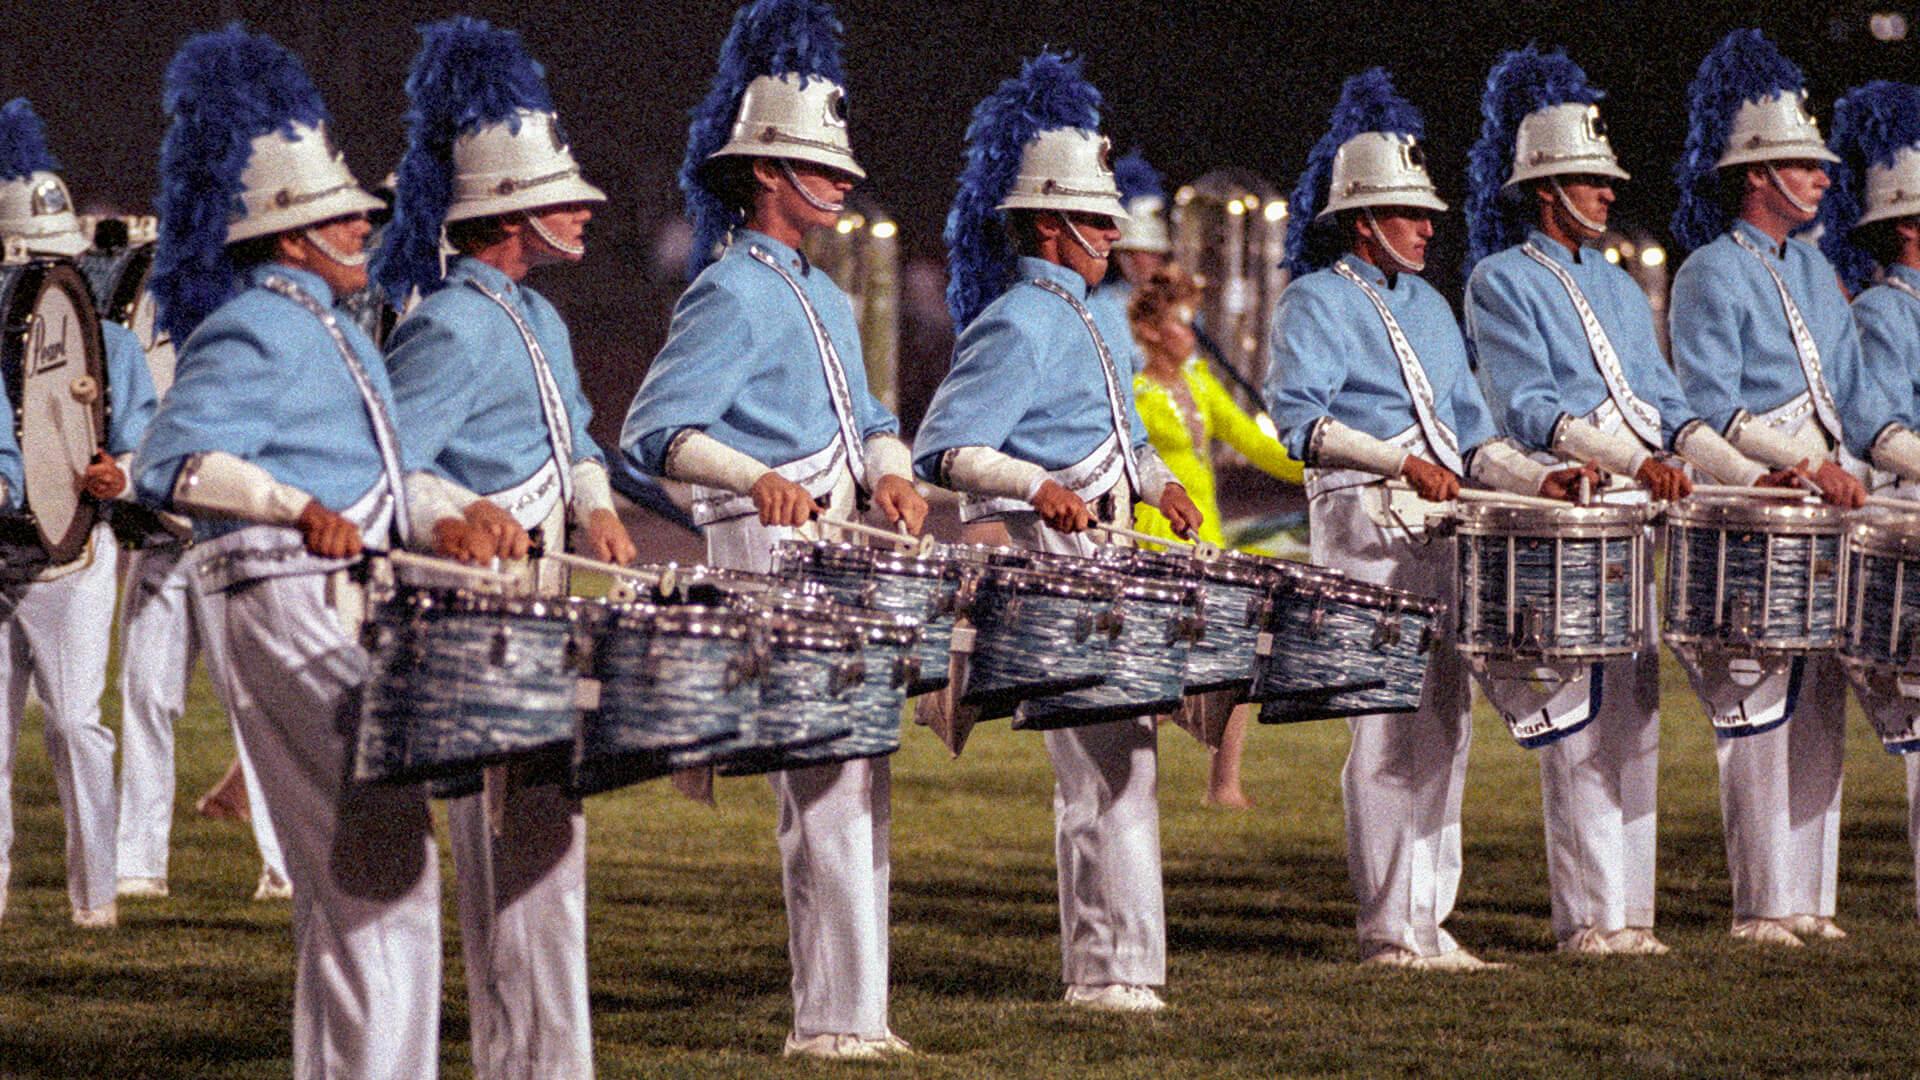 Spotlight of the Week: 1991 Bluecoats